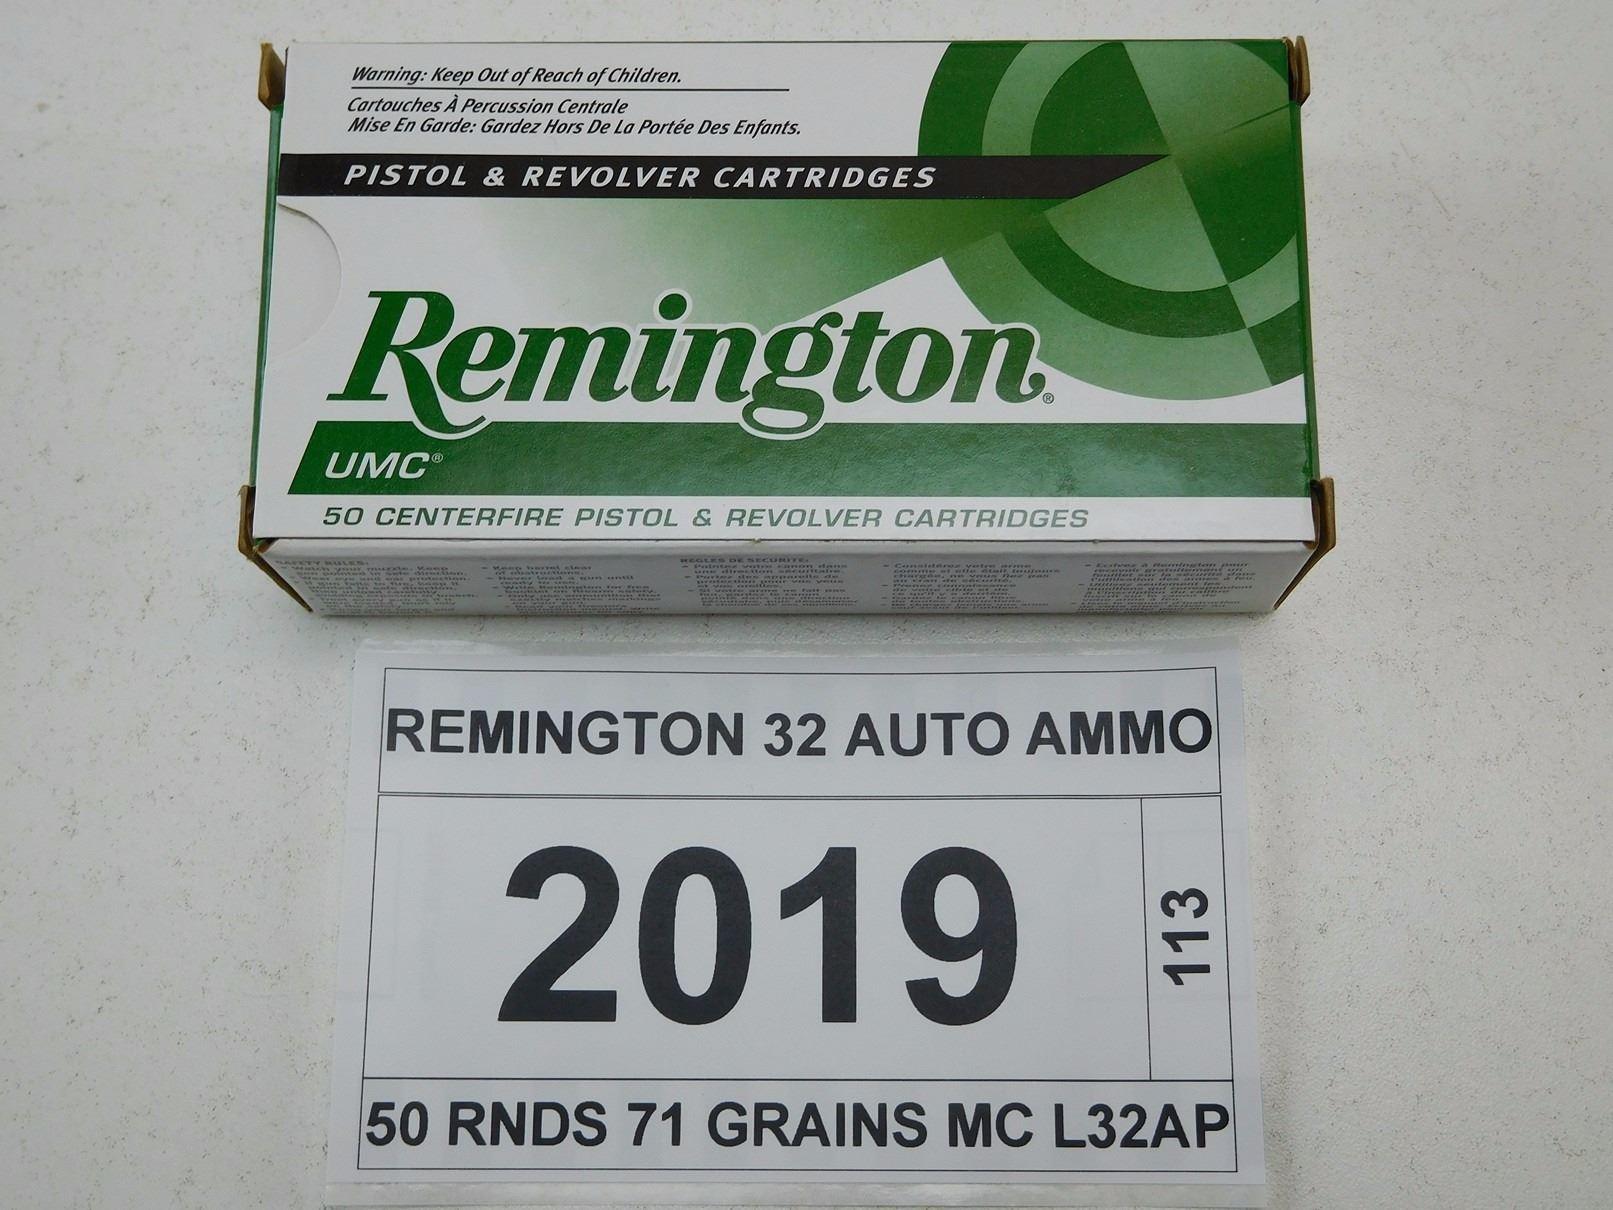 REMINGTON 32 AUTO AMMO